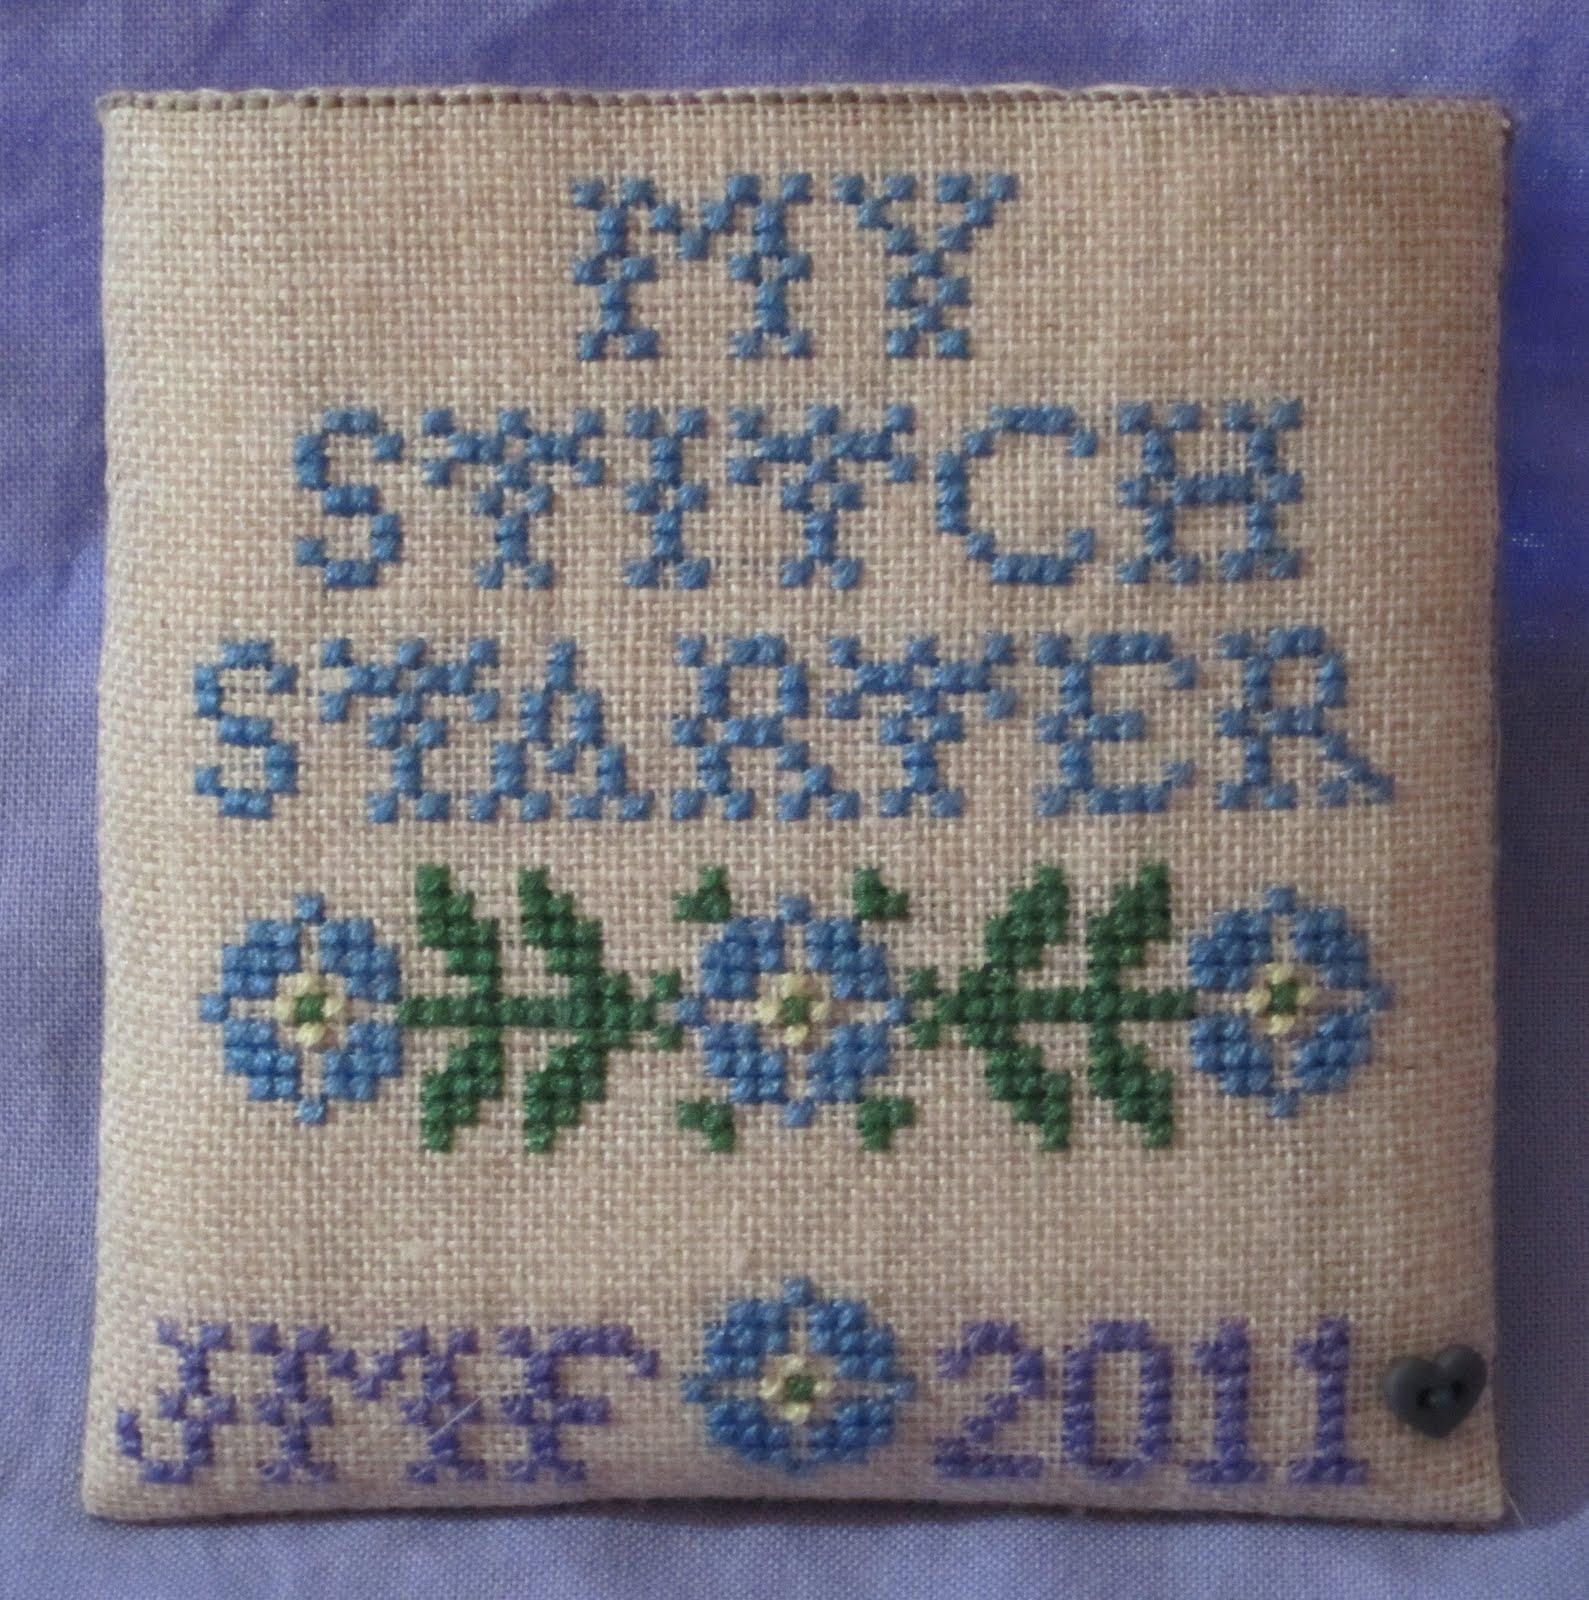 http://2.bp.blogspot.com/_xFO15BBYjuY/TSTR4jZNzgI/AAAAAAAAD_A/5vB6Lbt_PS4/s1600/Stitch%2BStarter%2BBack.JPG